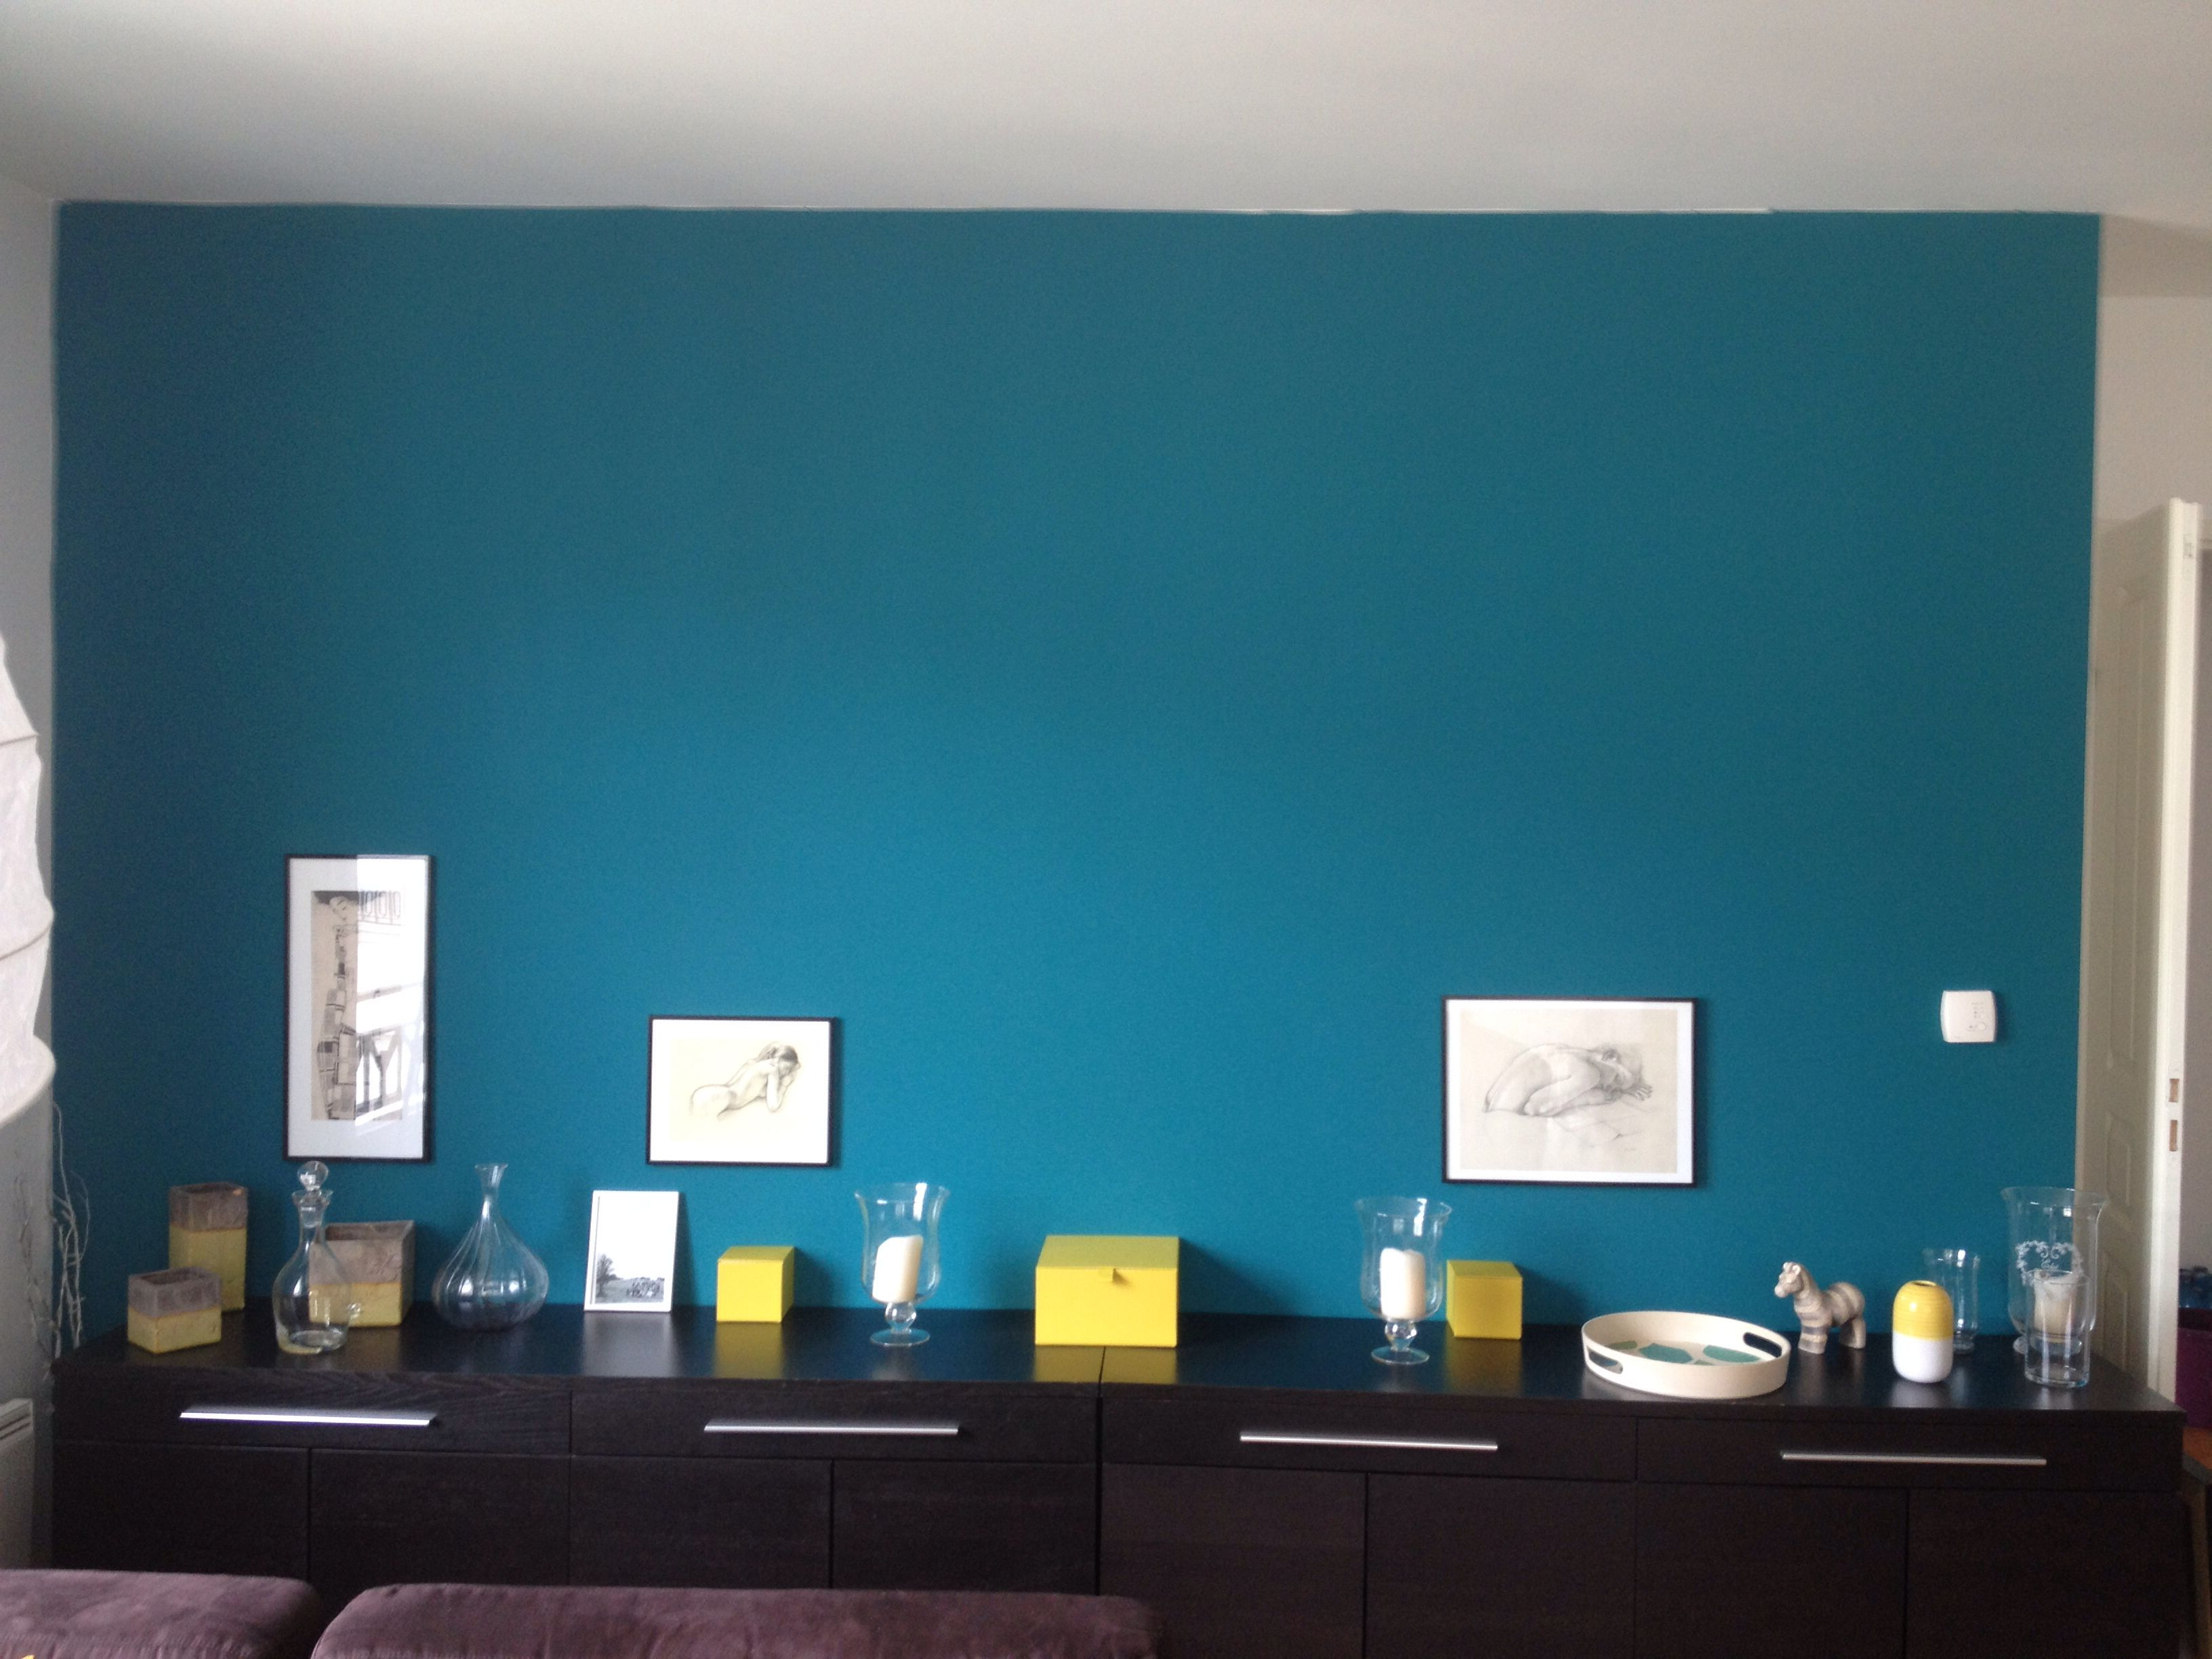 Mur salon bleu canard ... | Projets à essayer | Idée déco ...